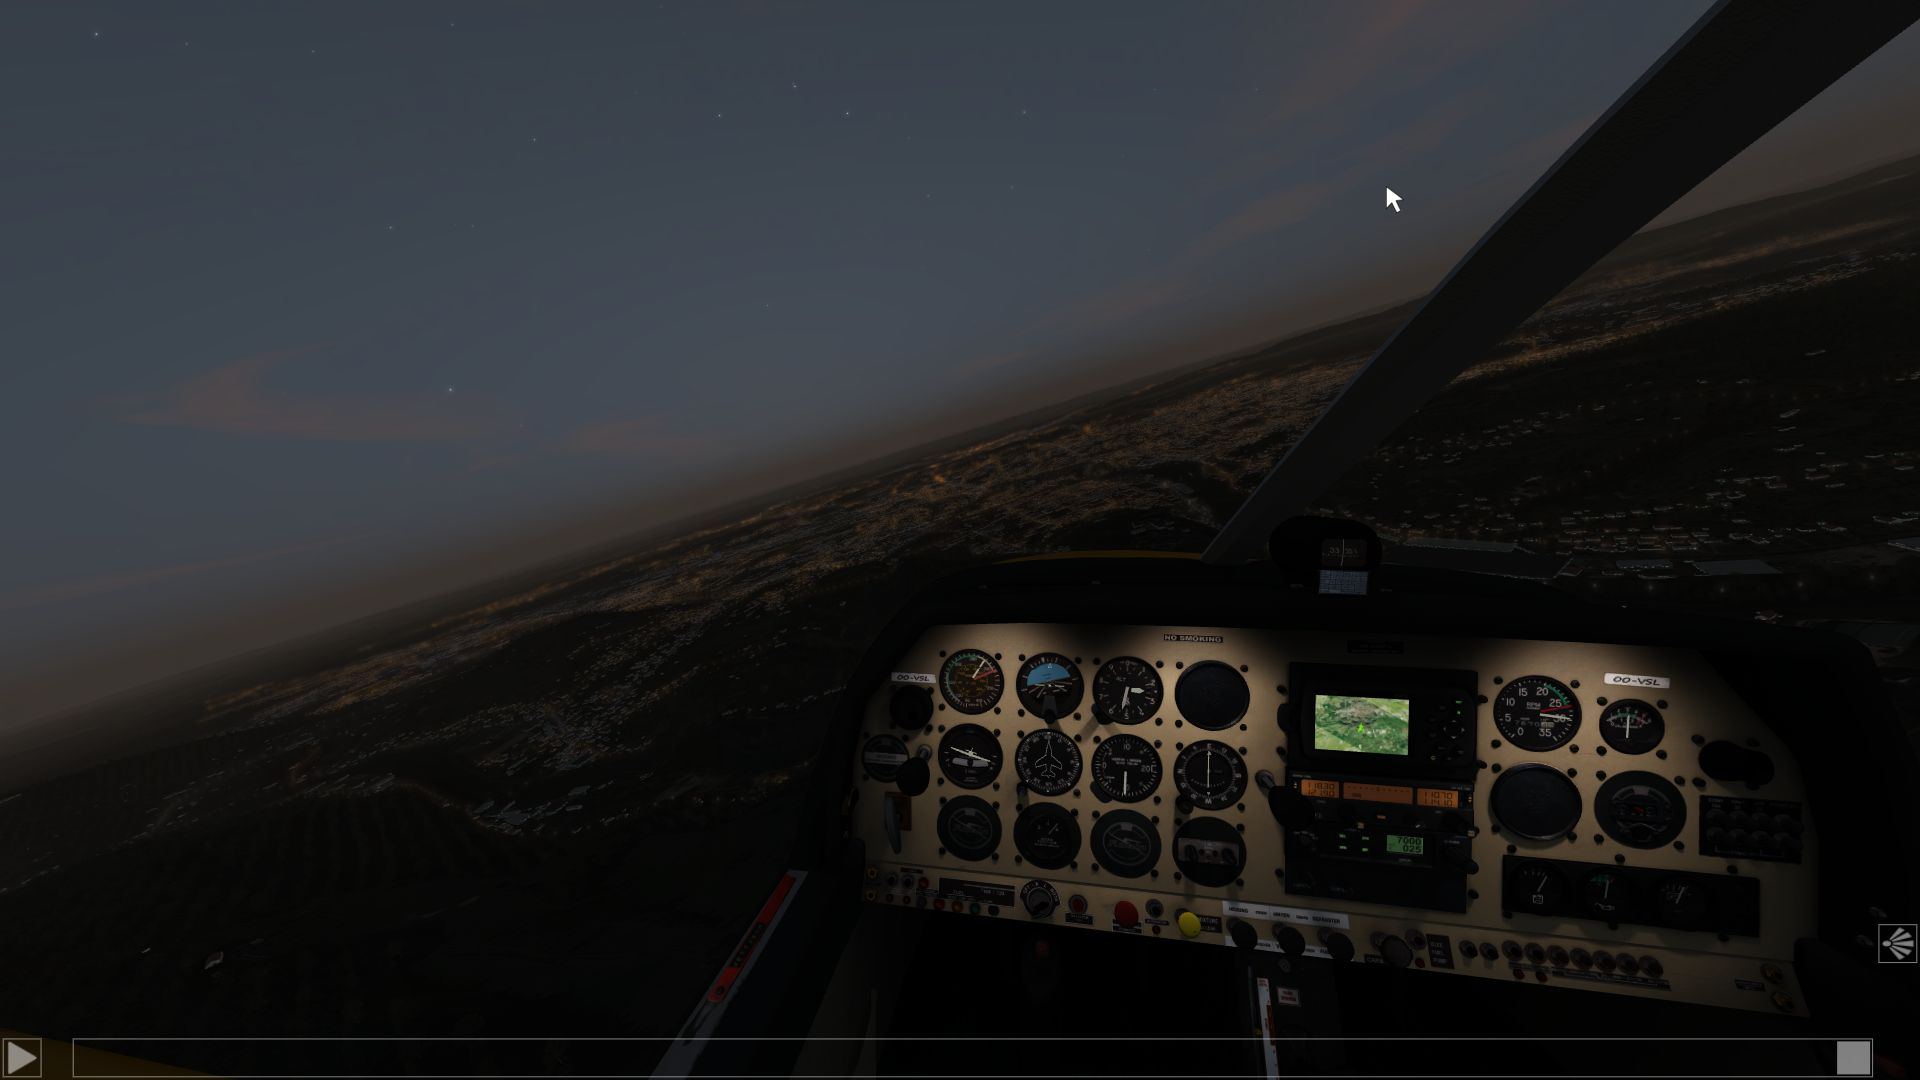 http://www.pilote-virtuel.com/img/gallery/1517173480.jpg